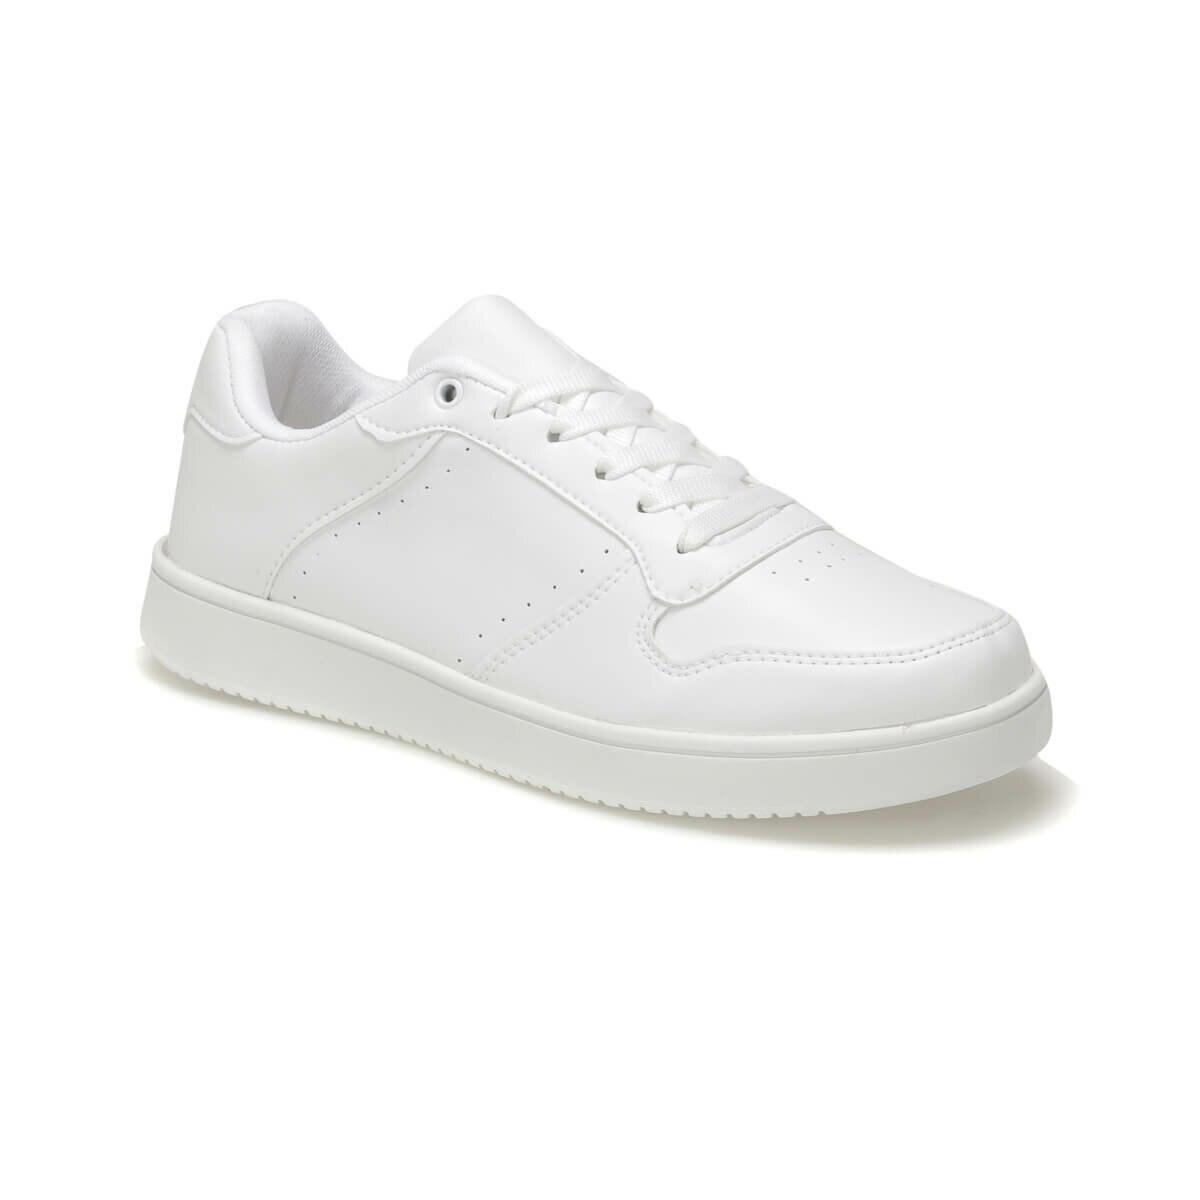 FLO BESTA White Men 'S Sneaker Shoes Torex